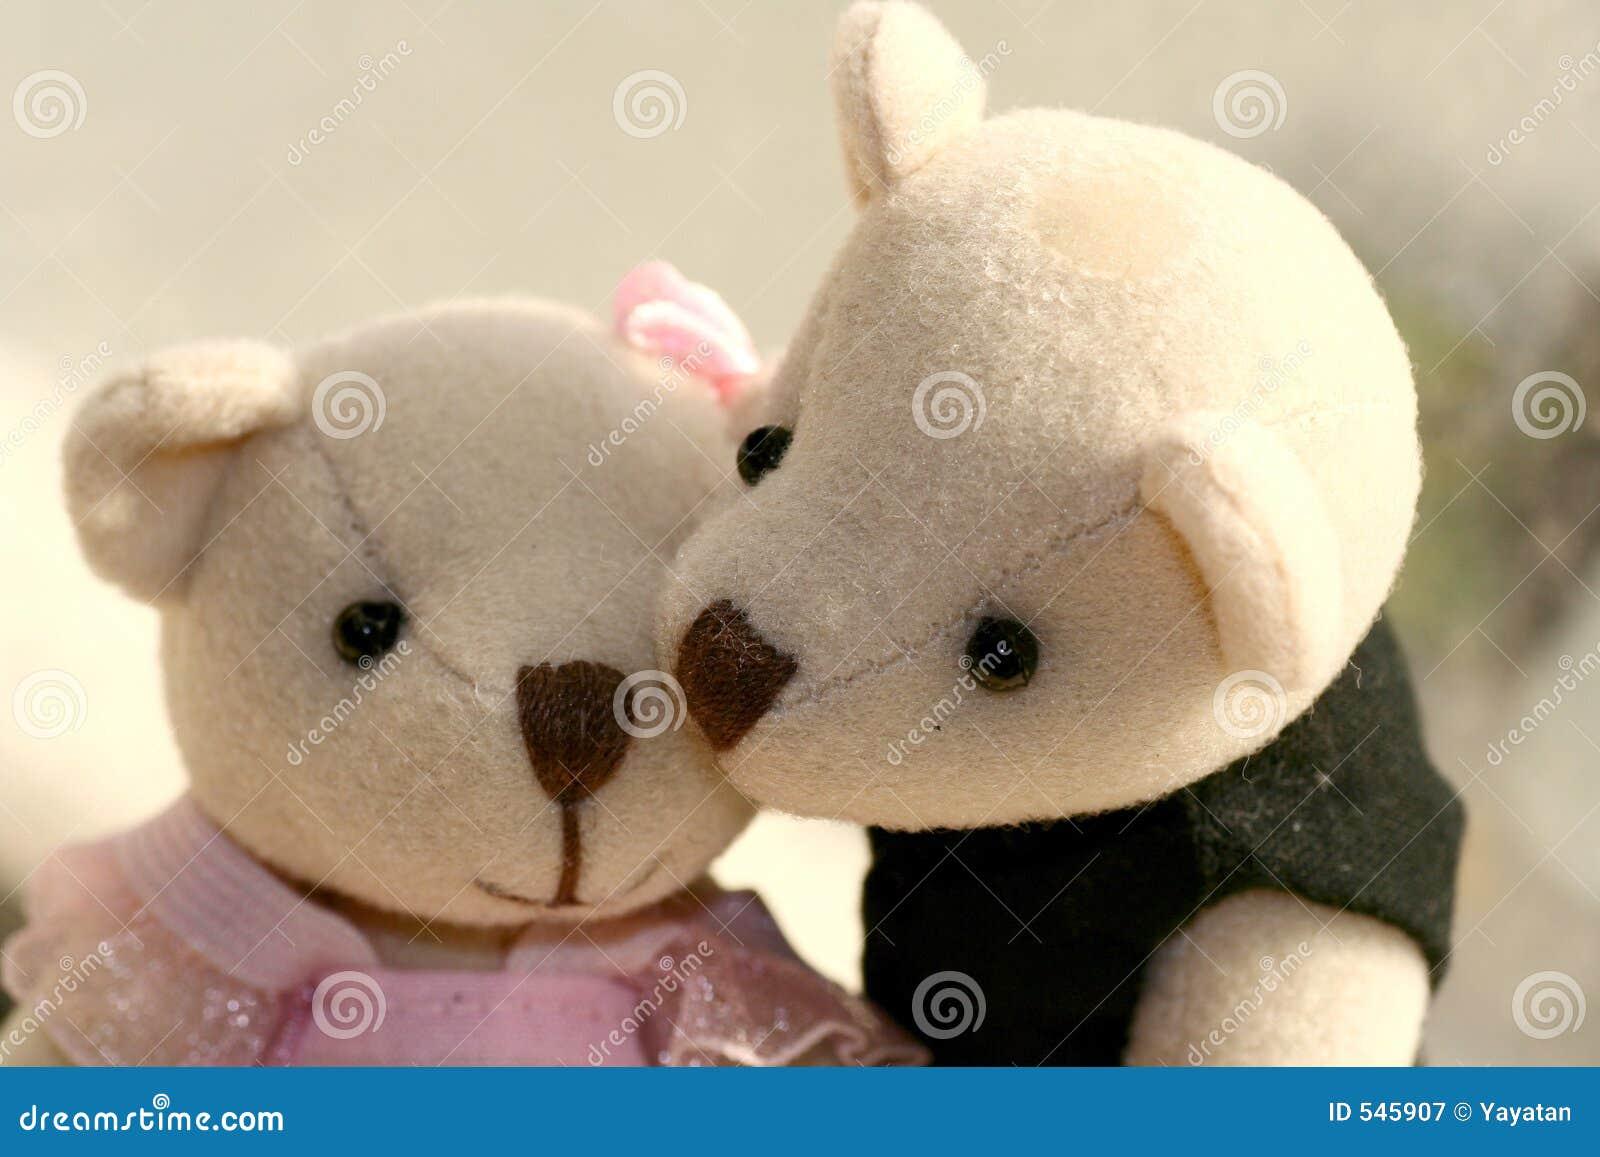 Download 亲吻您 库存图片. 图片 包括有 敲打, 拥抱, 亲吻, 女用连杉衬裤, 逗人喜爱, 玩具, 舒适, 言情, 一起 - 545907